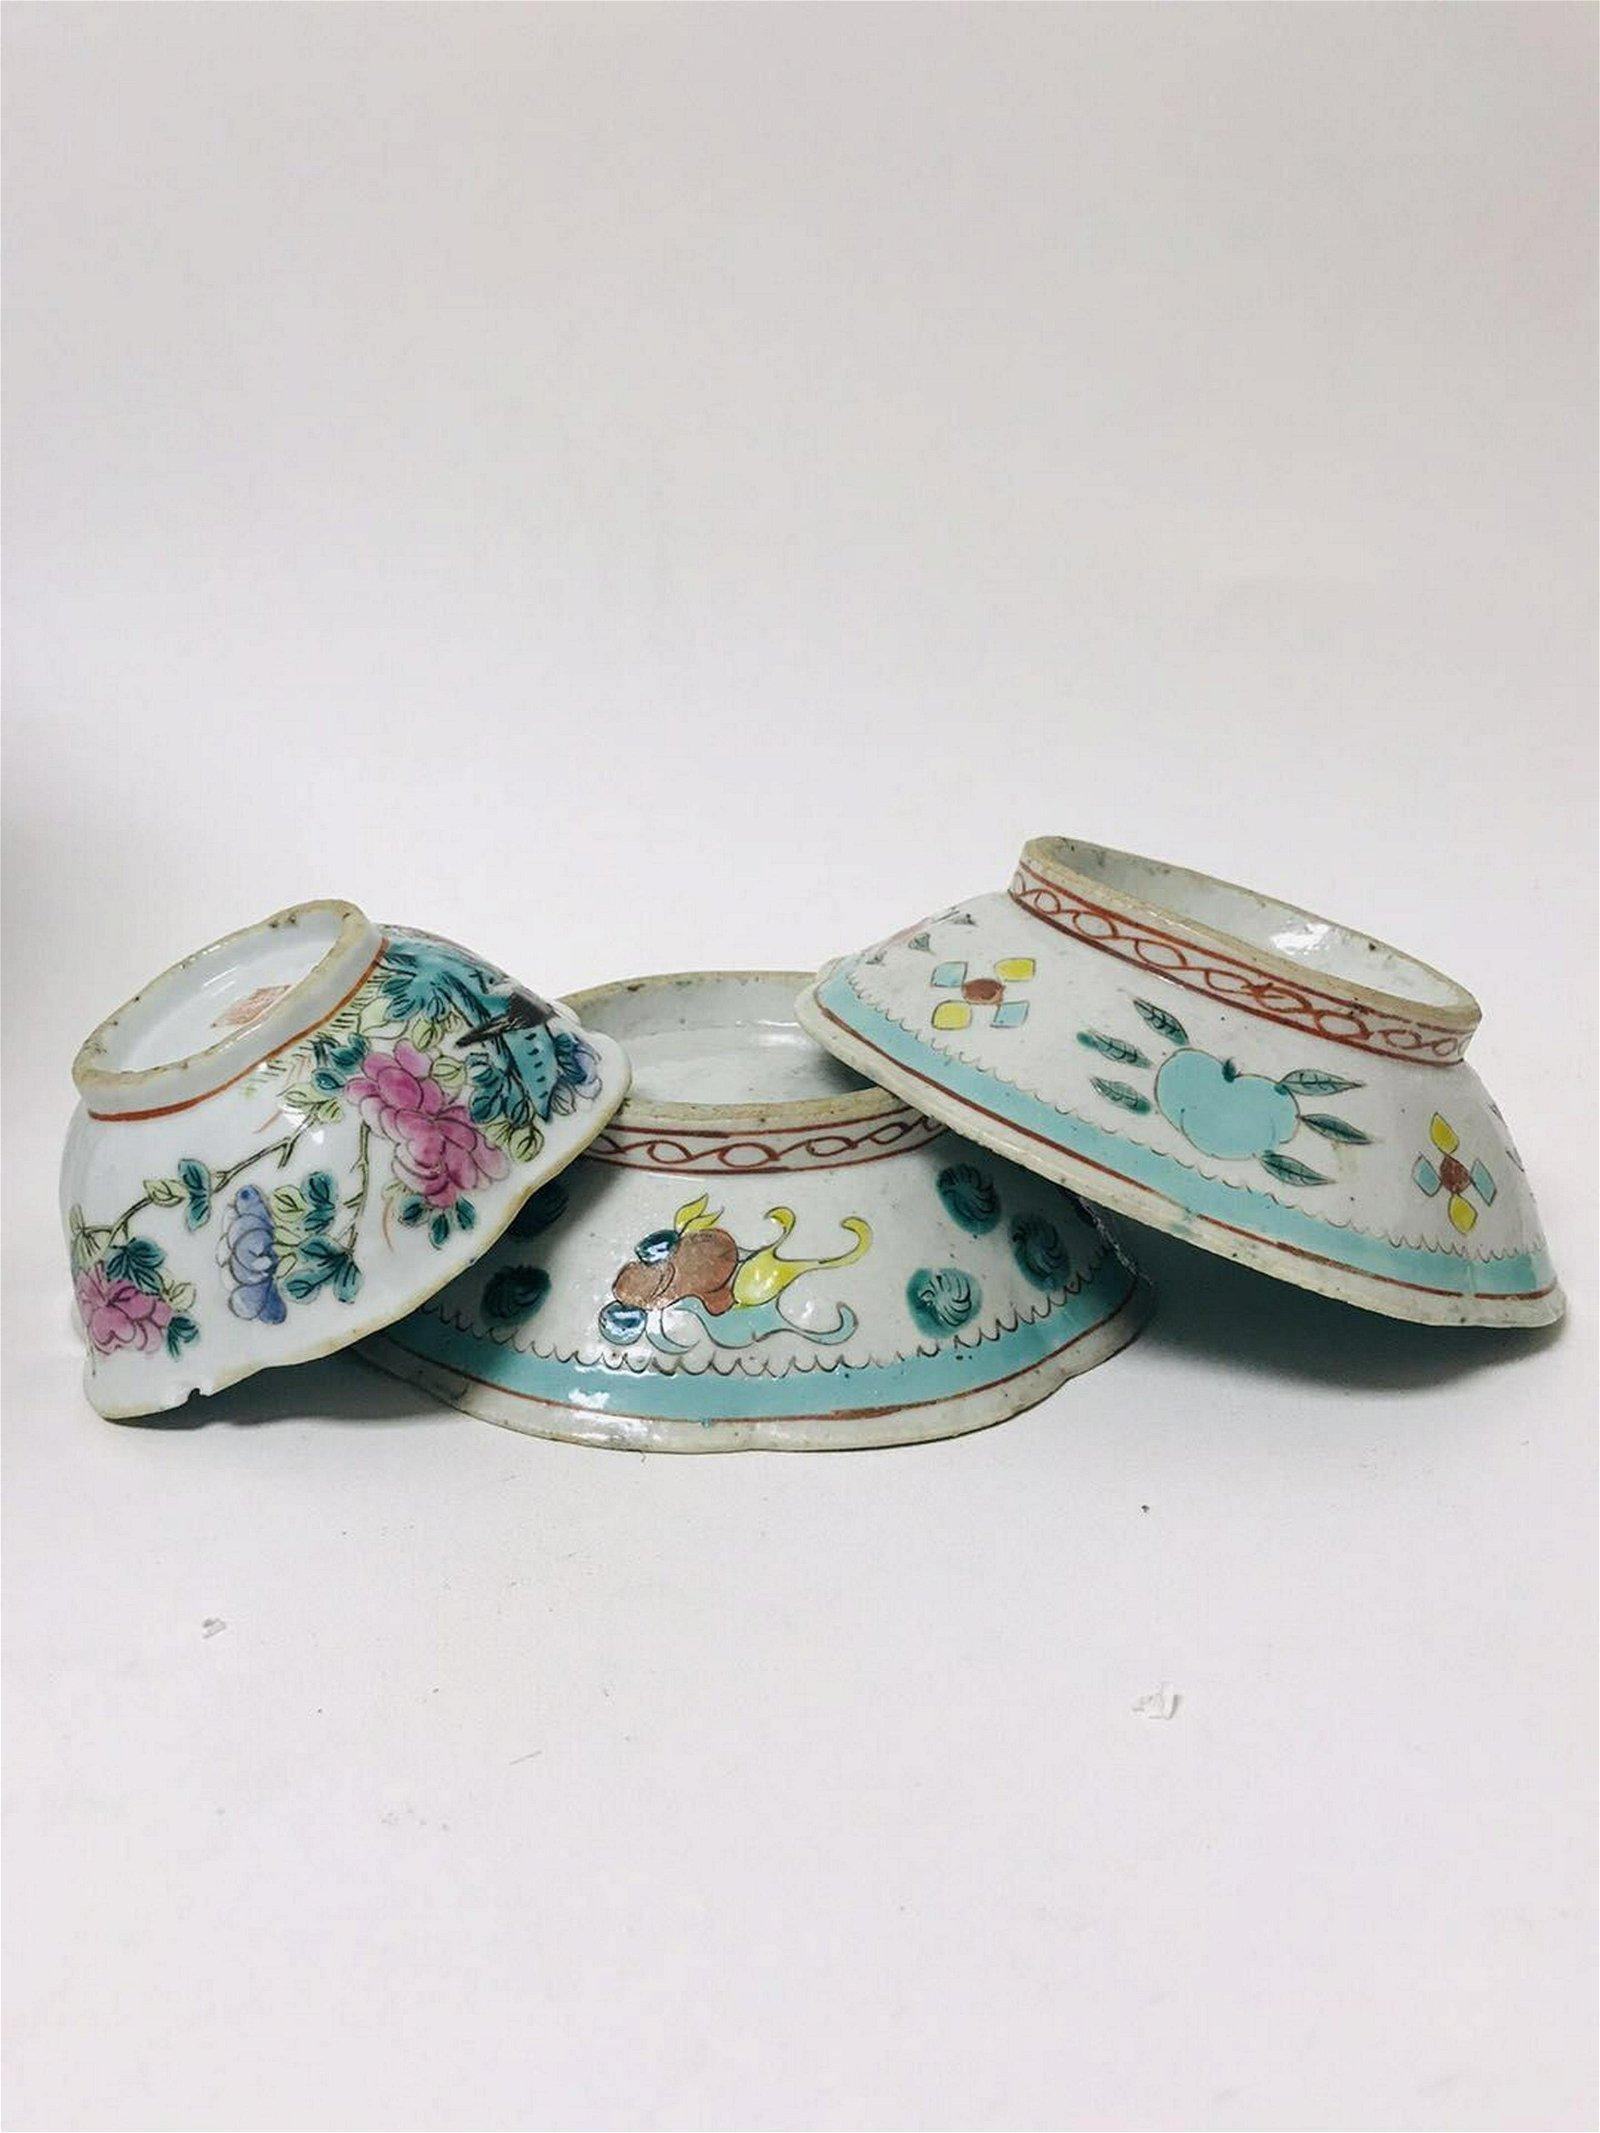 Three Late Qing Porcelain Bowl